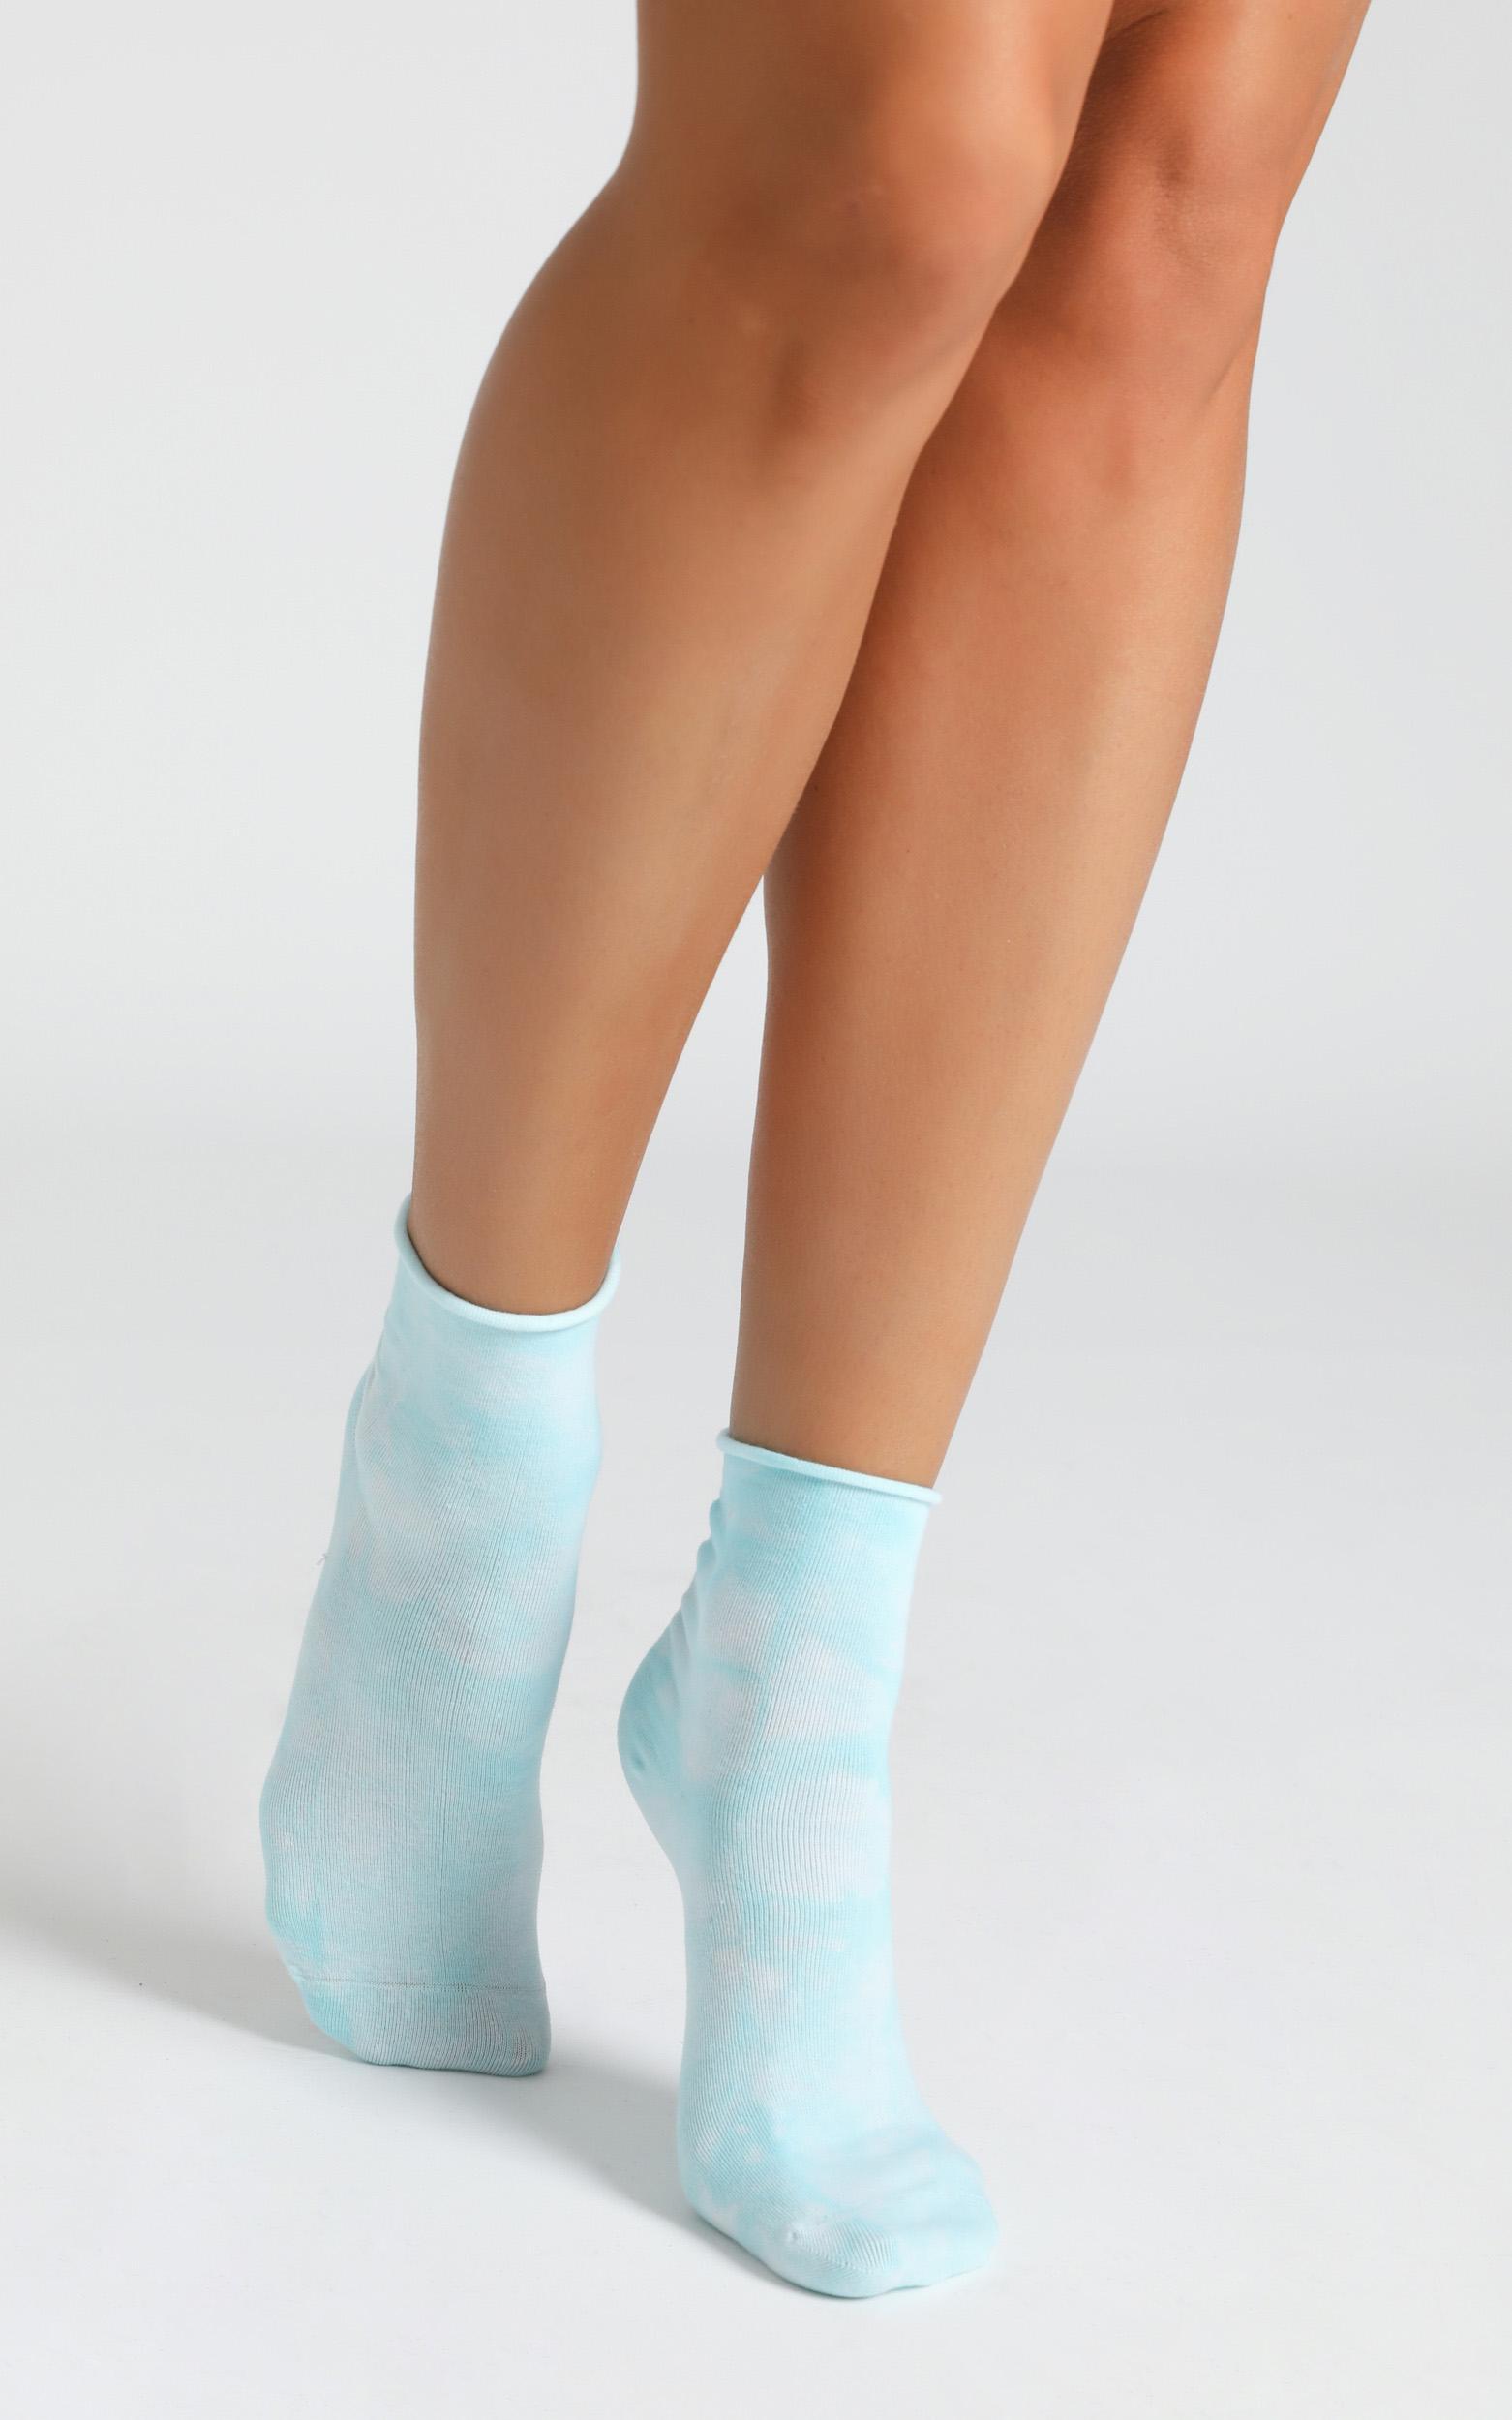 Superga - 3 Pack Cotton Crew Tie Dye Socks In Blue, Light Sky, Pink, , hi-res image number null